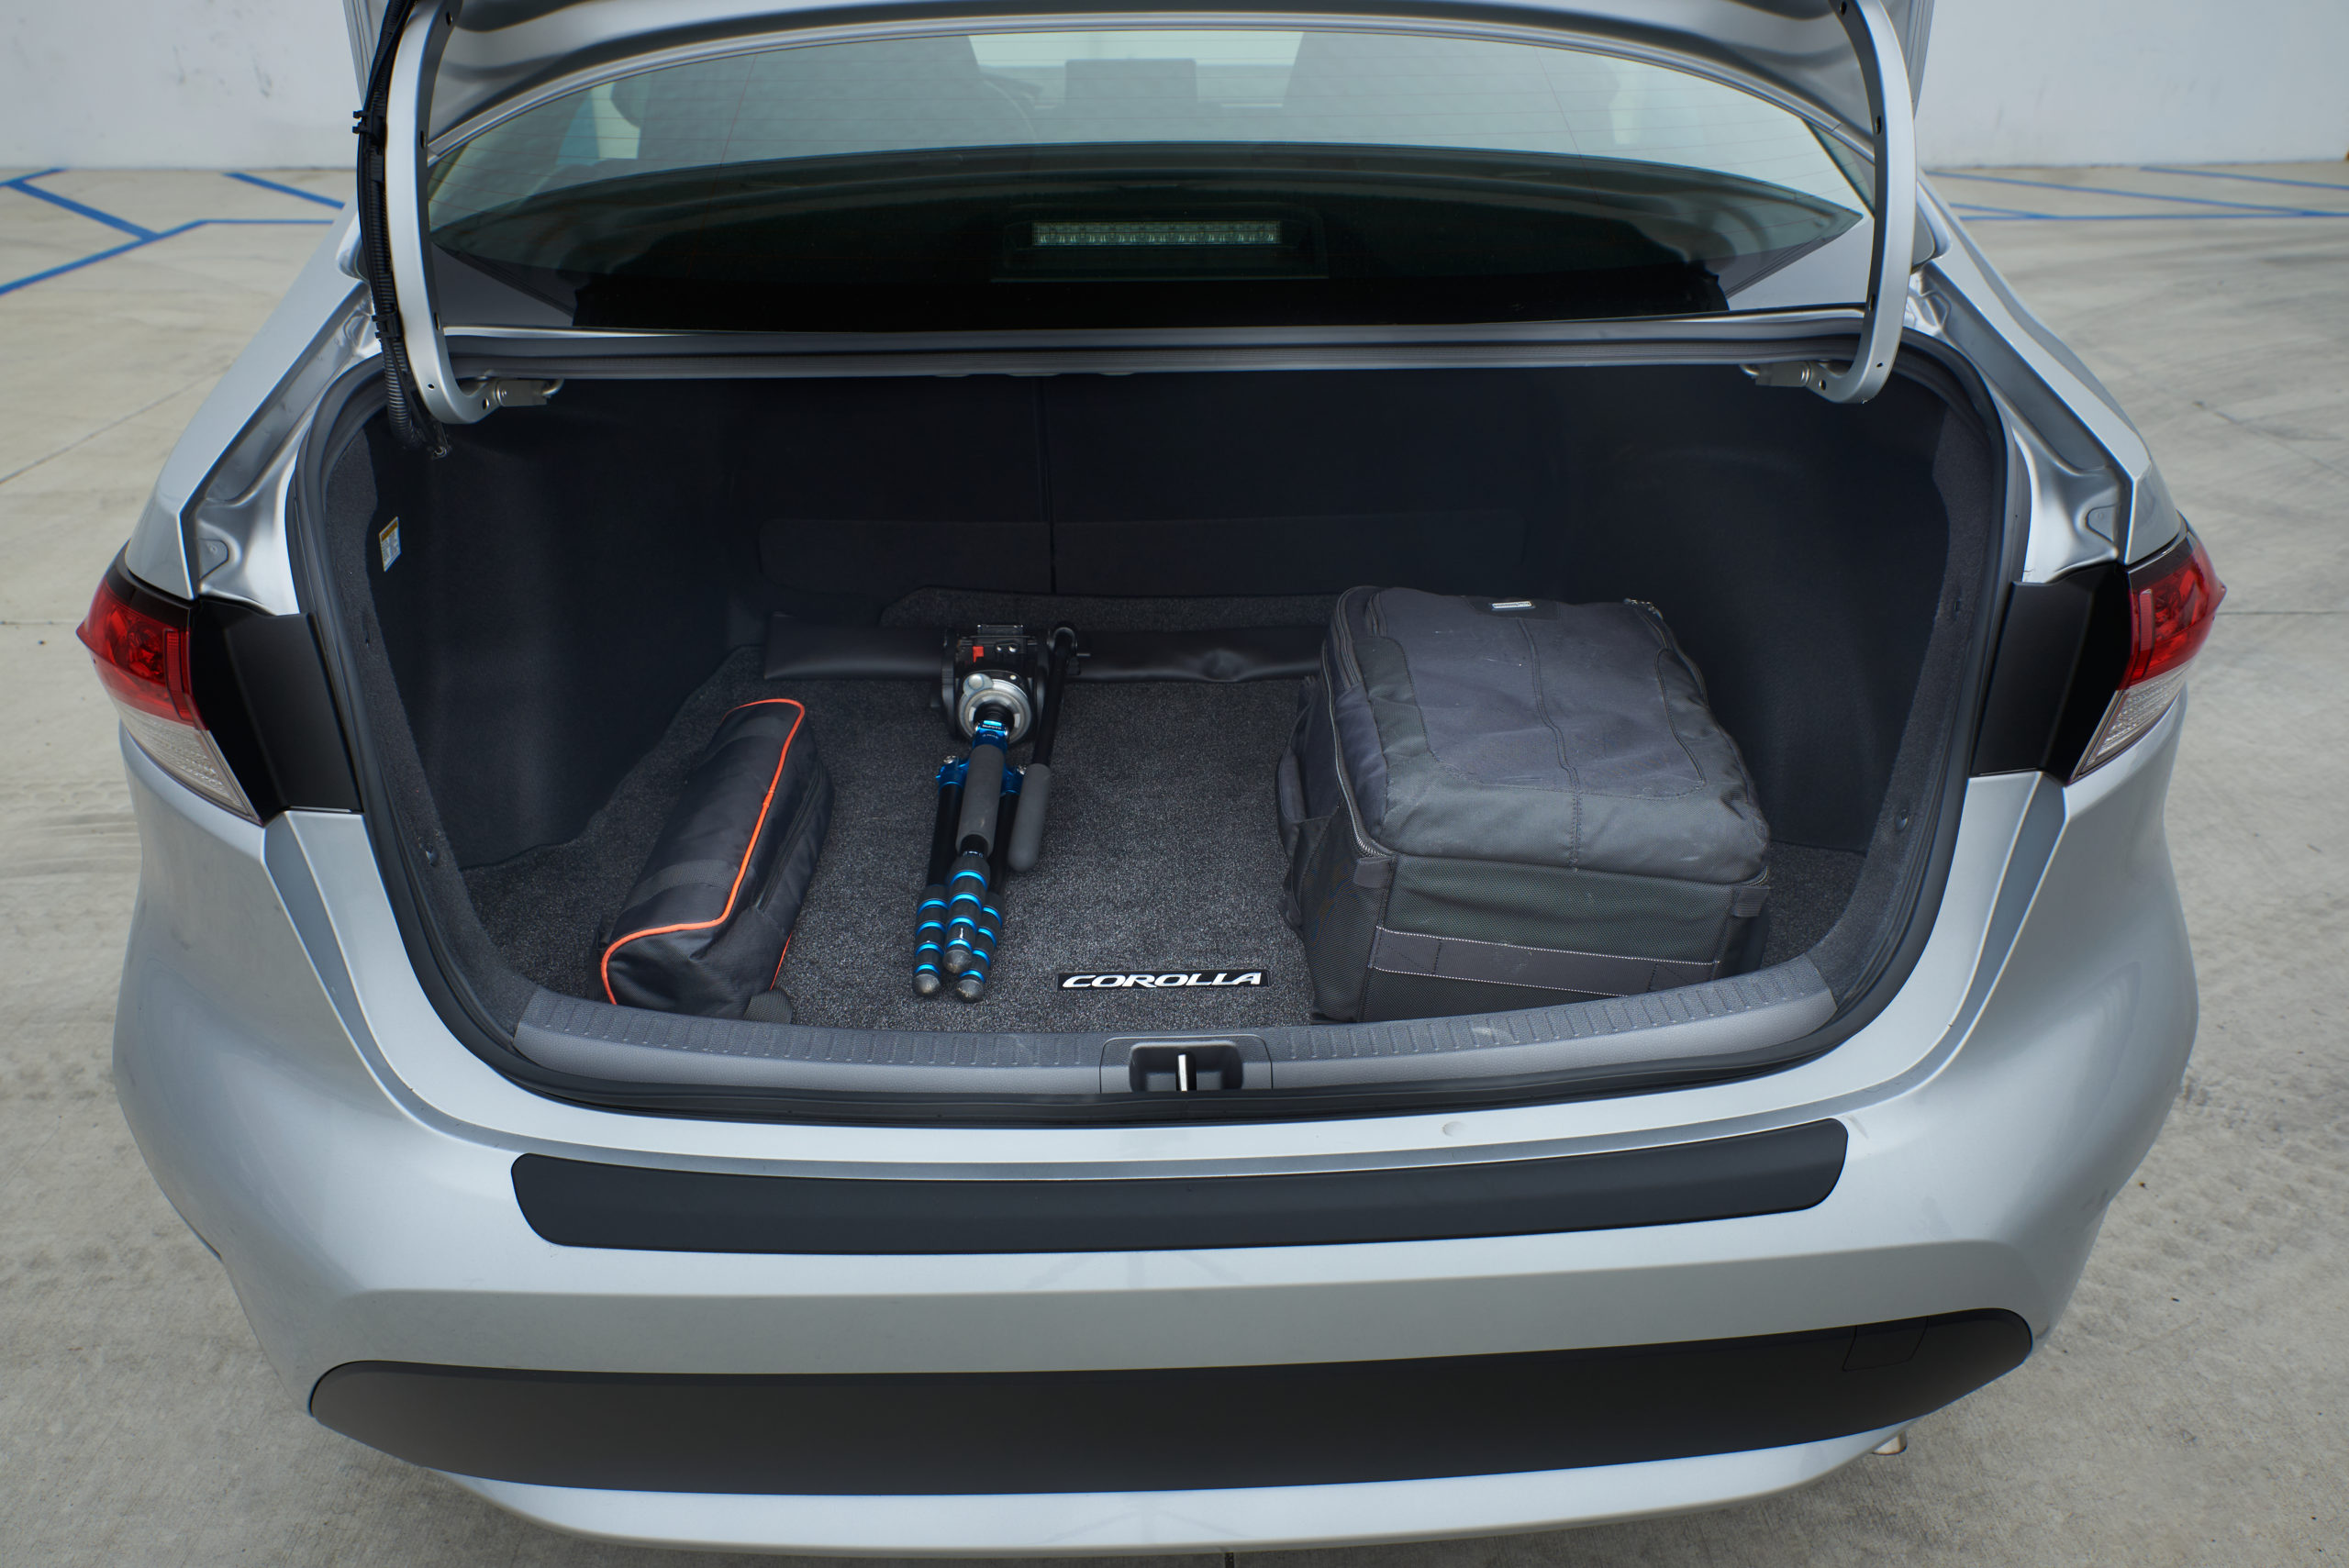 2021 Toyota Corolla Hybrid trunk space